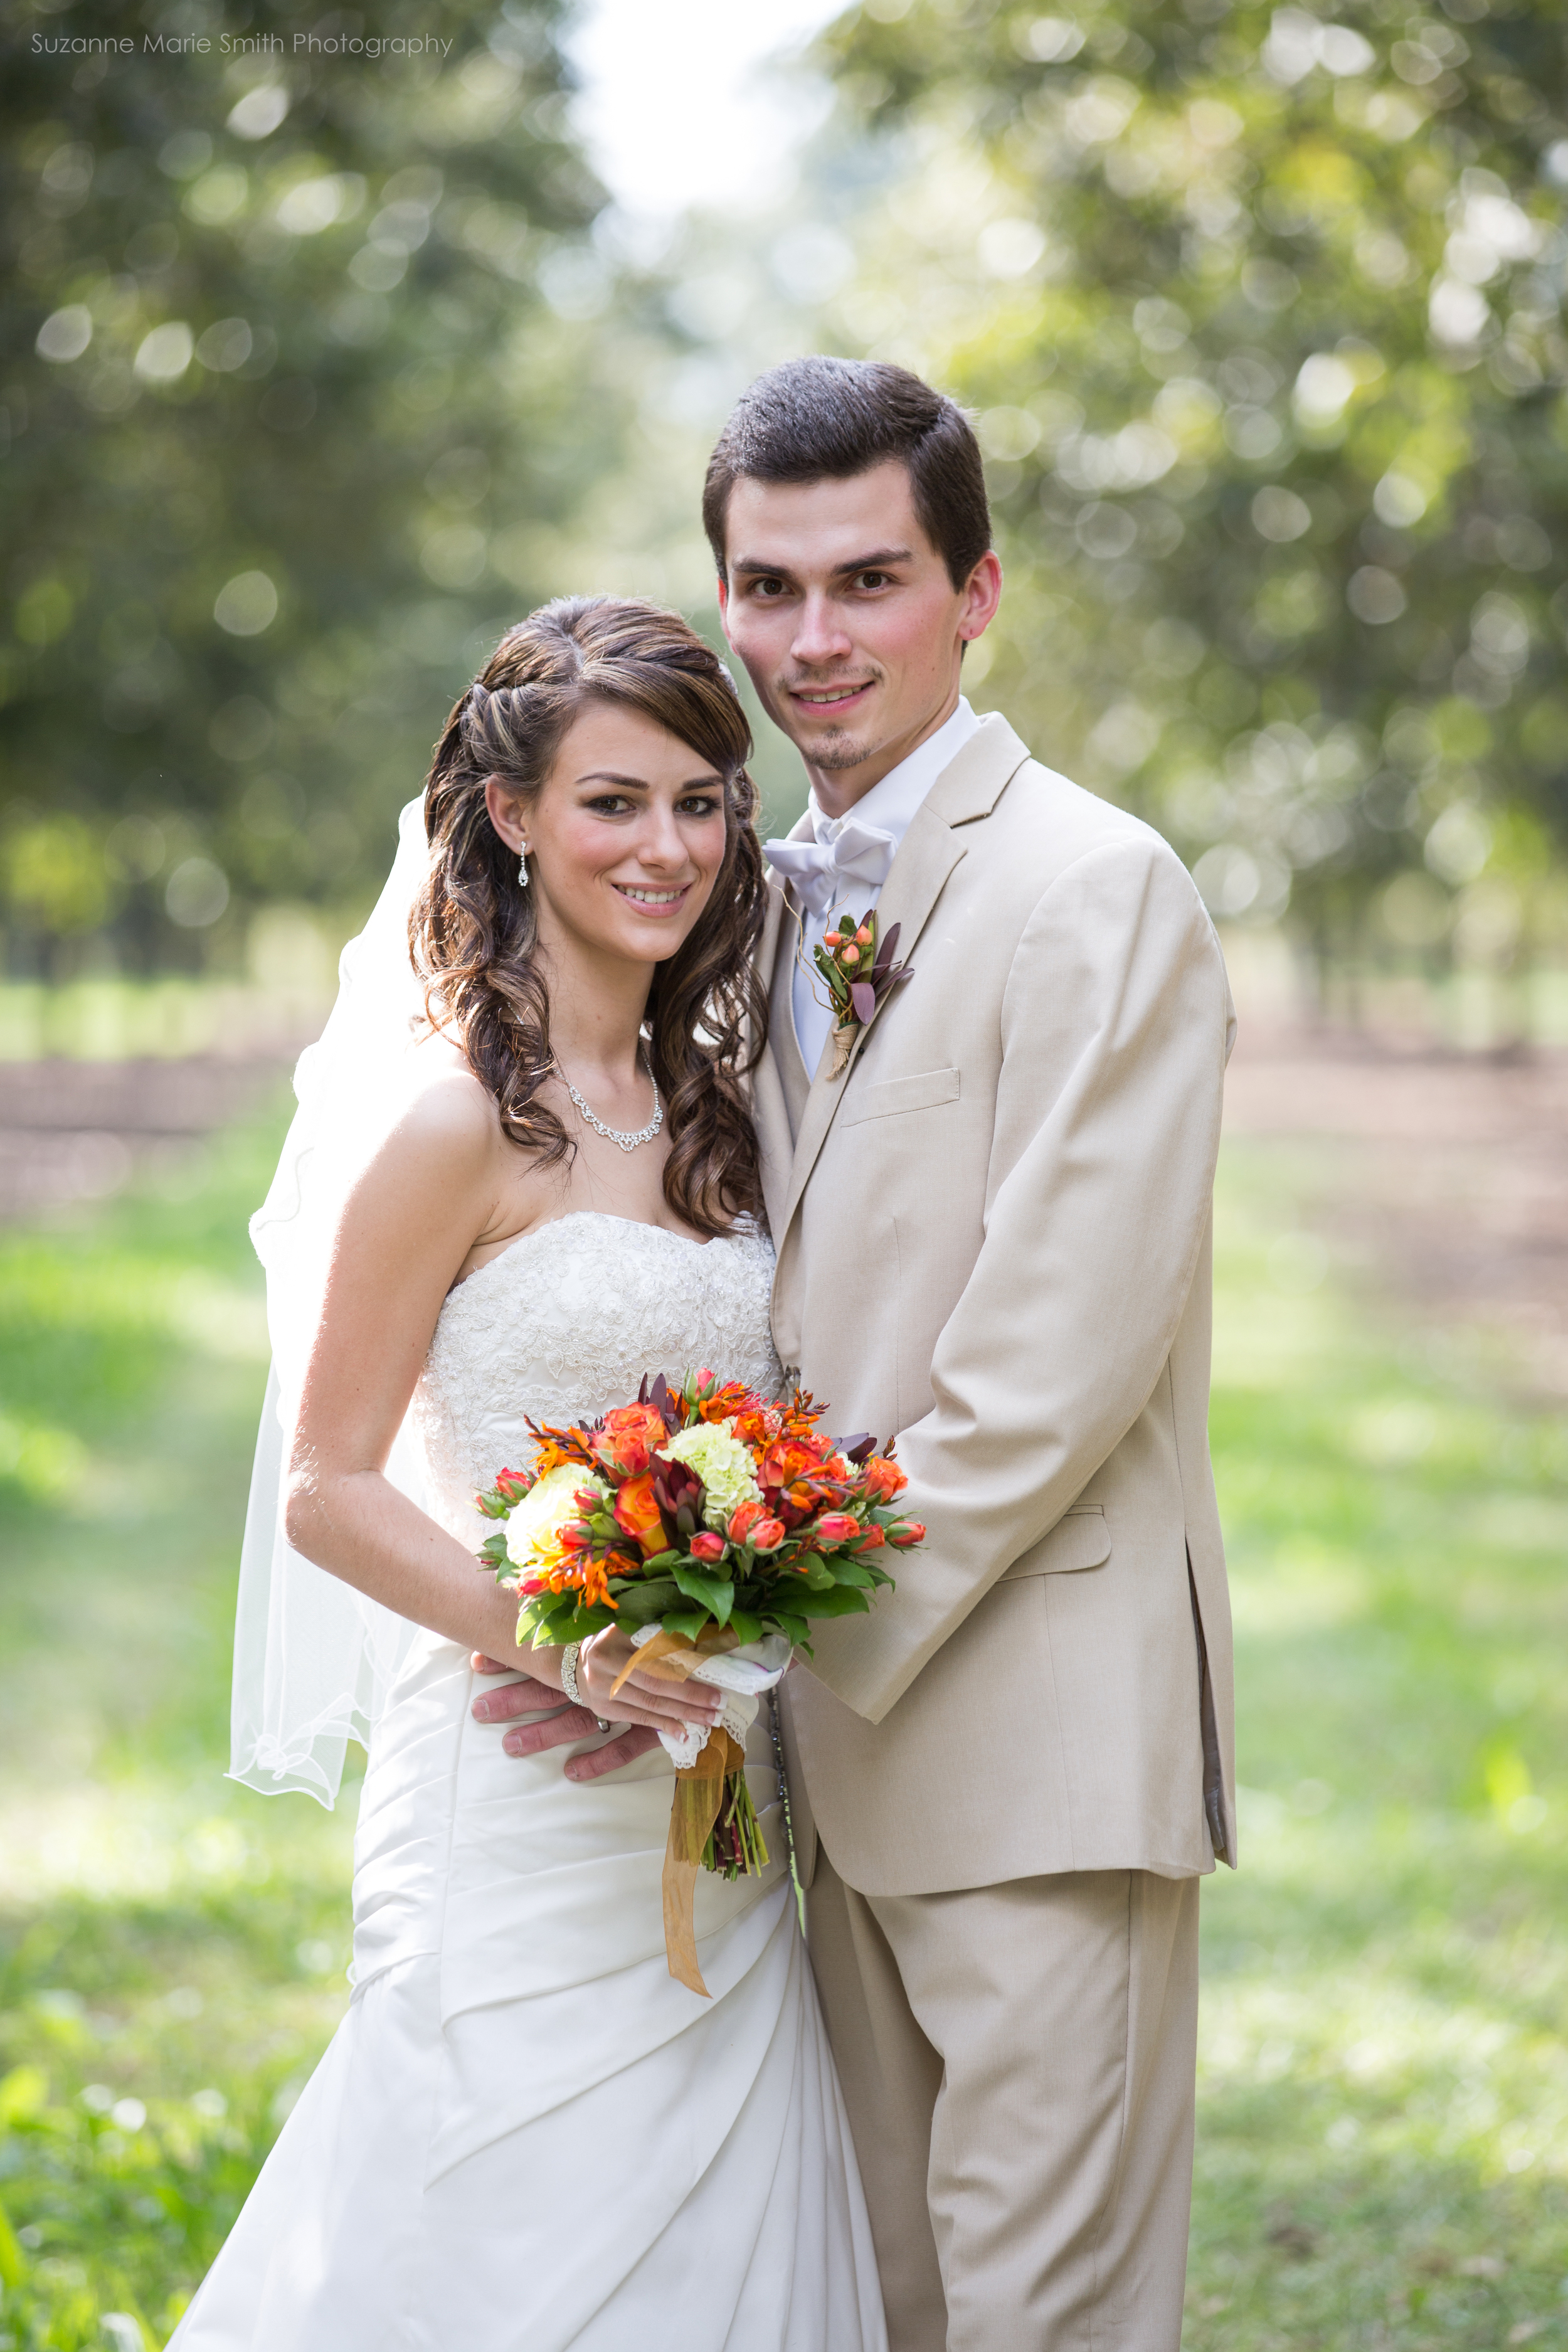 A beautiful couple